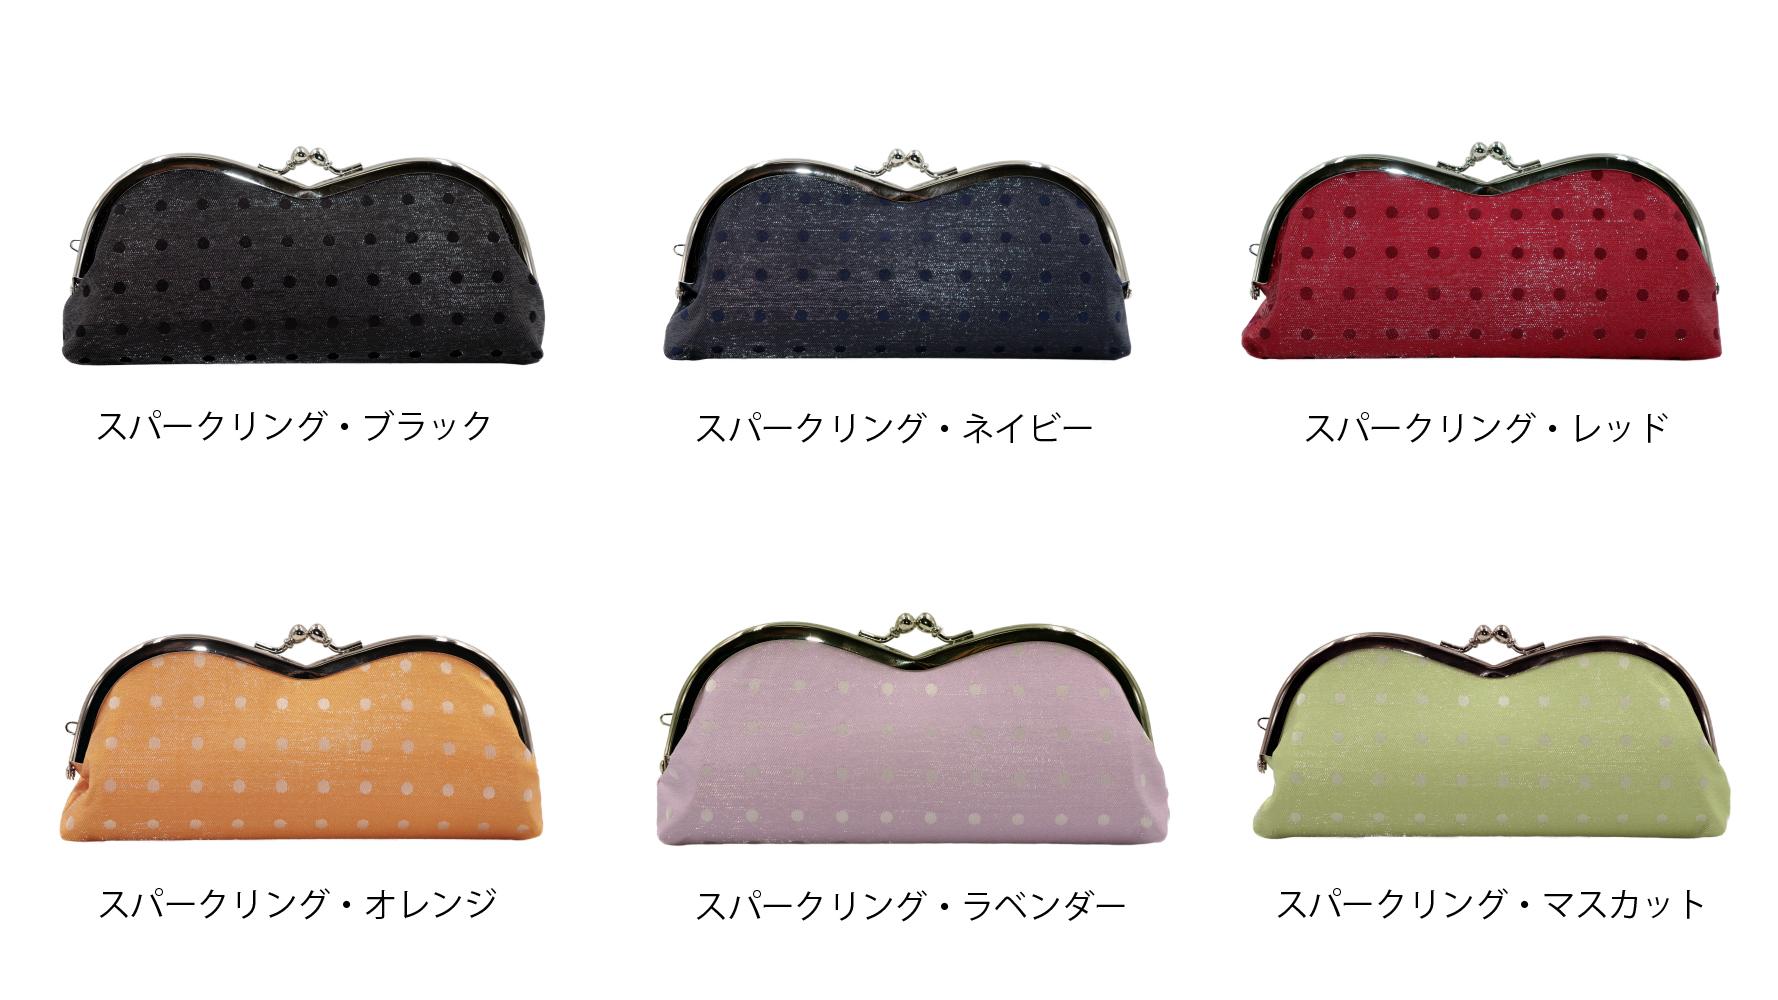 Atelier Kyoto Nishijin/西陣織シルク×艶やかナイロン・山型眼鏡ケース・水玉・スパークリングラベンダー・日本製